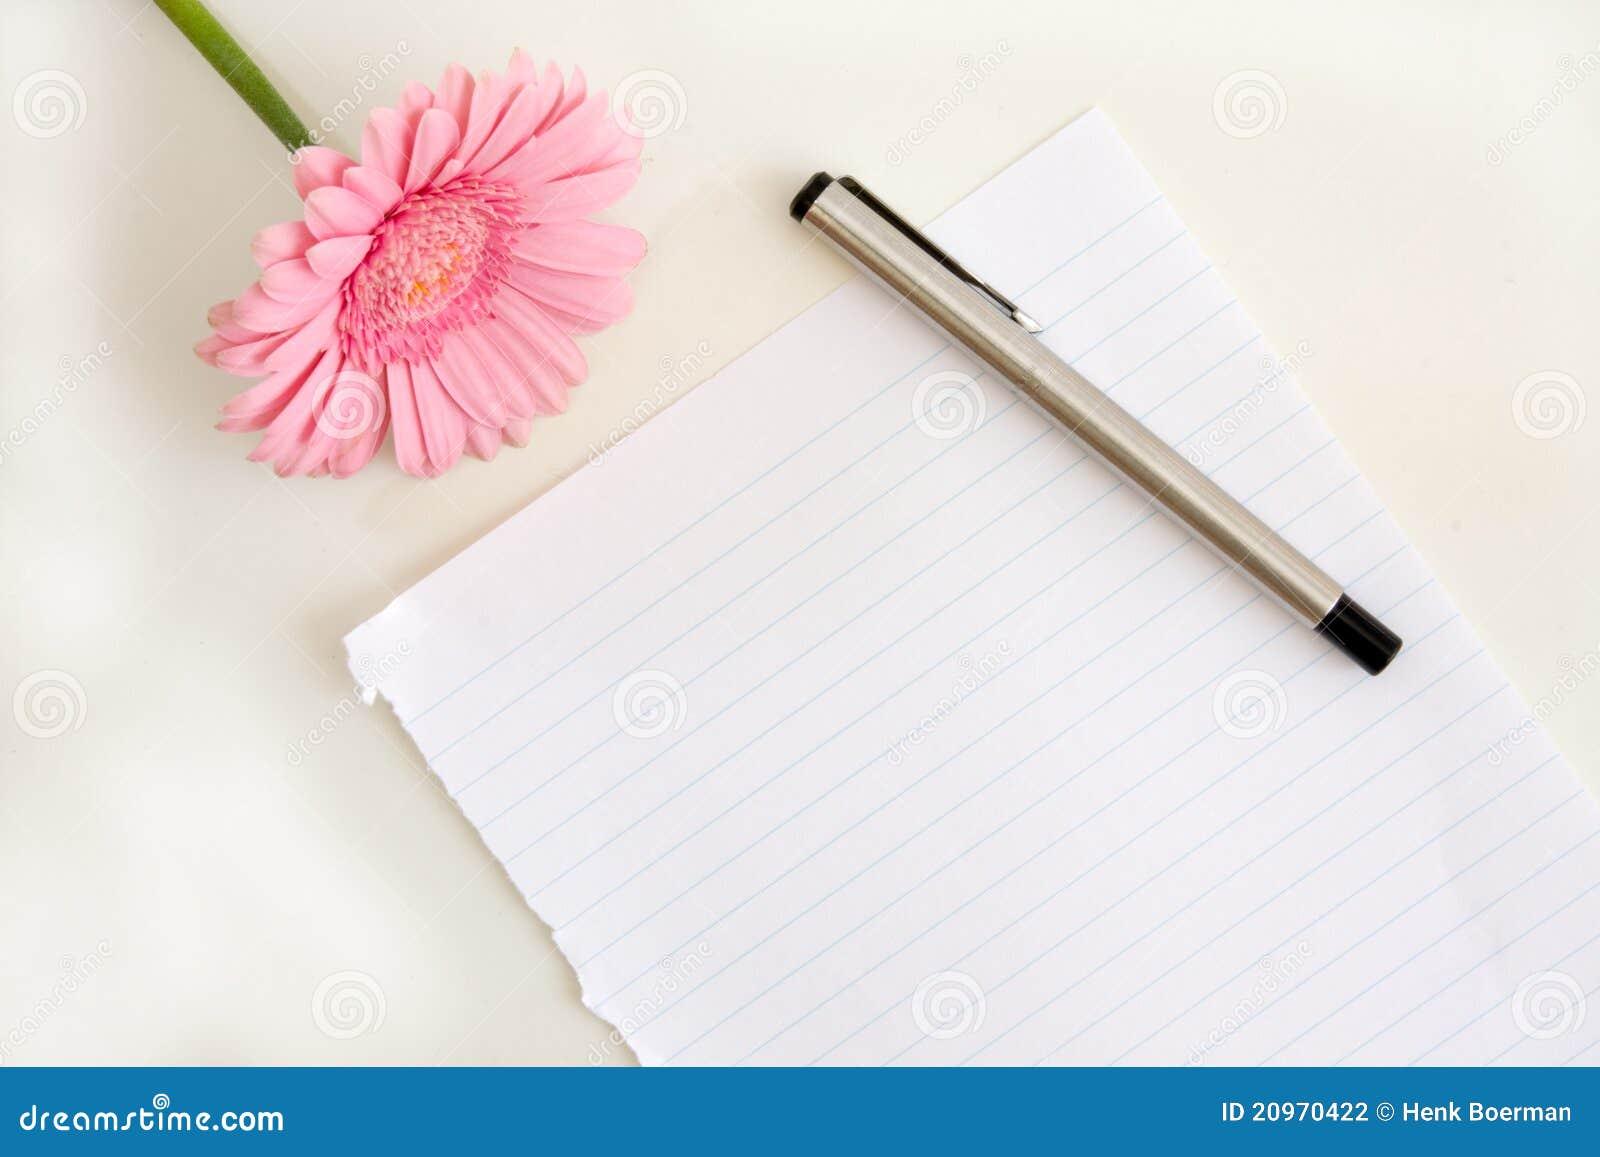 Paper flower pens images flower decoration ideas paper flower pens choice image flower decoration ideas paper flower pens image collections flower decoration ideas mightylinksfo